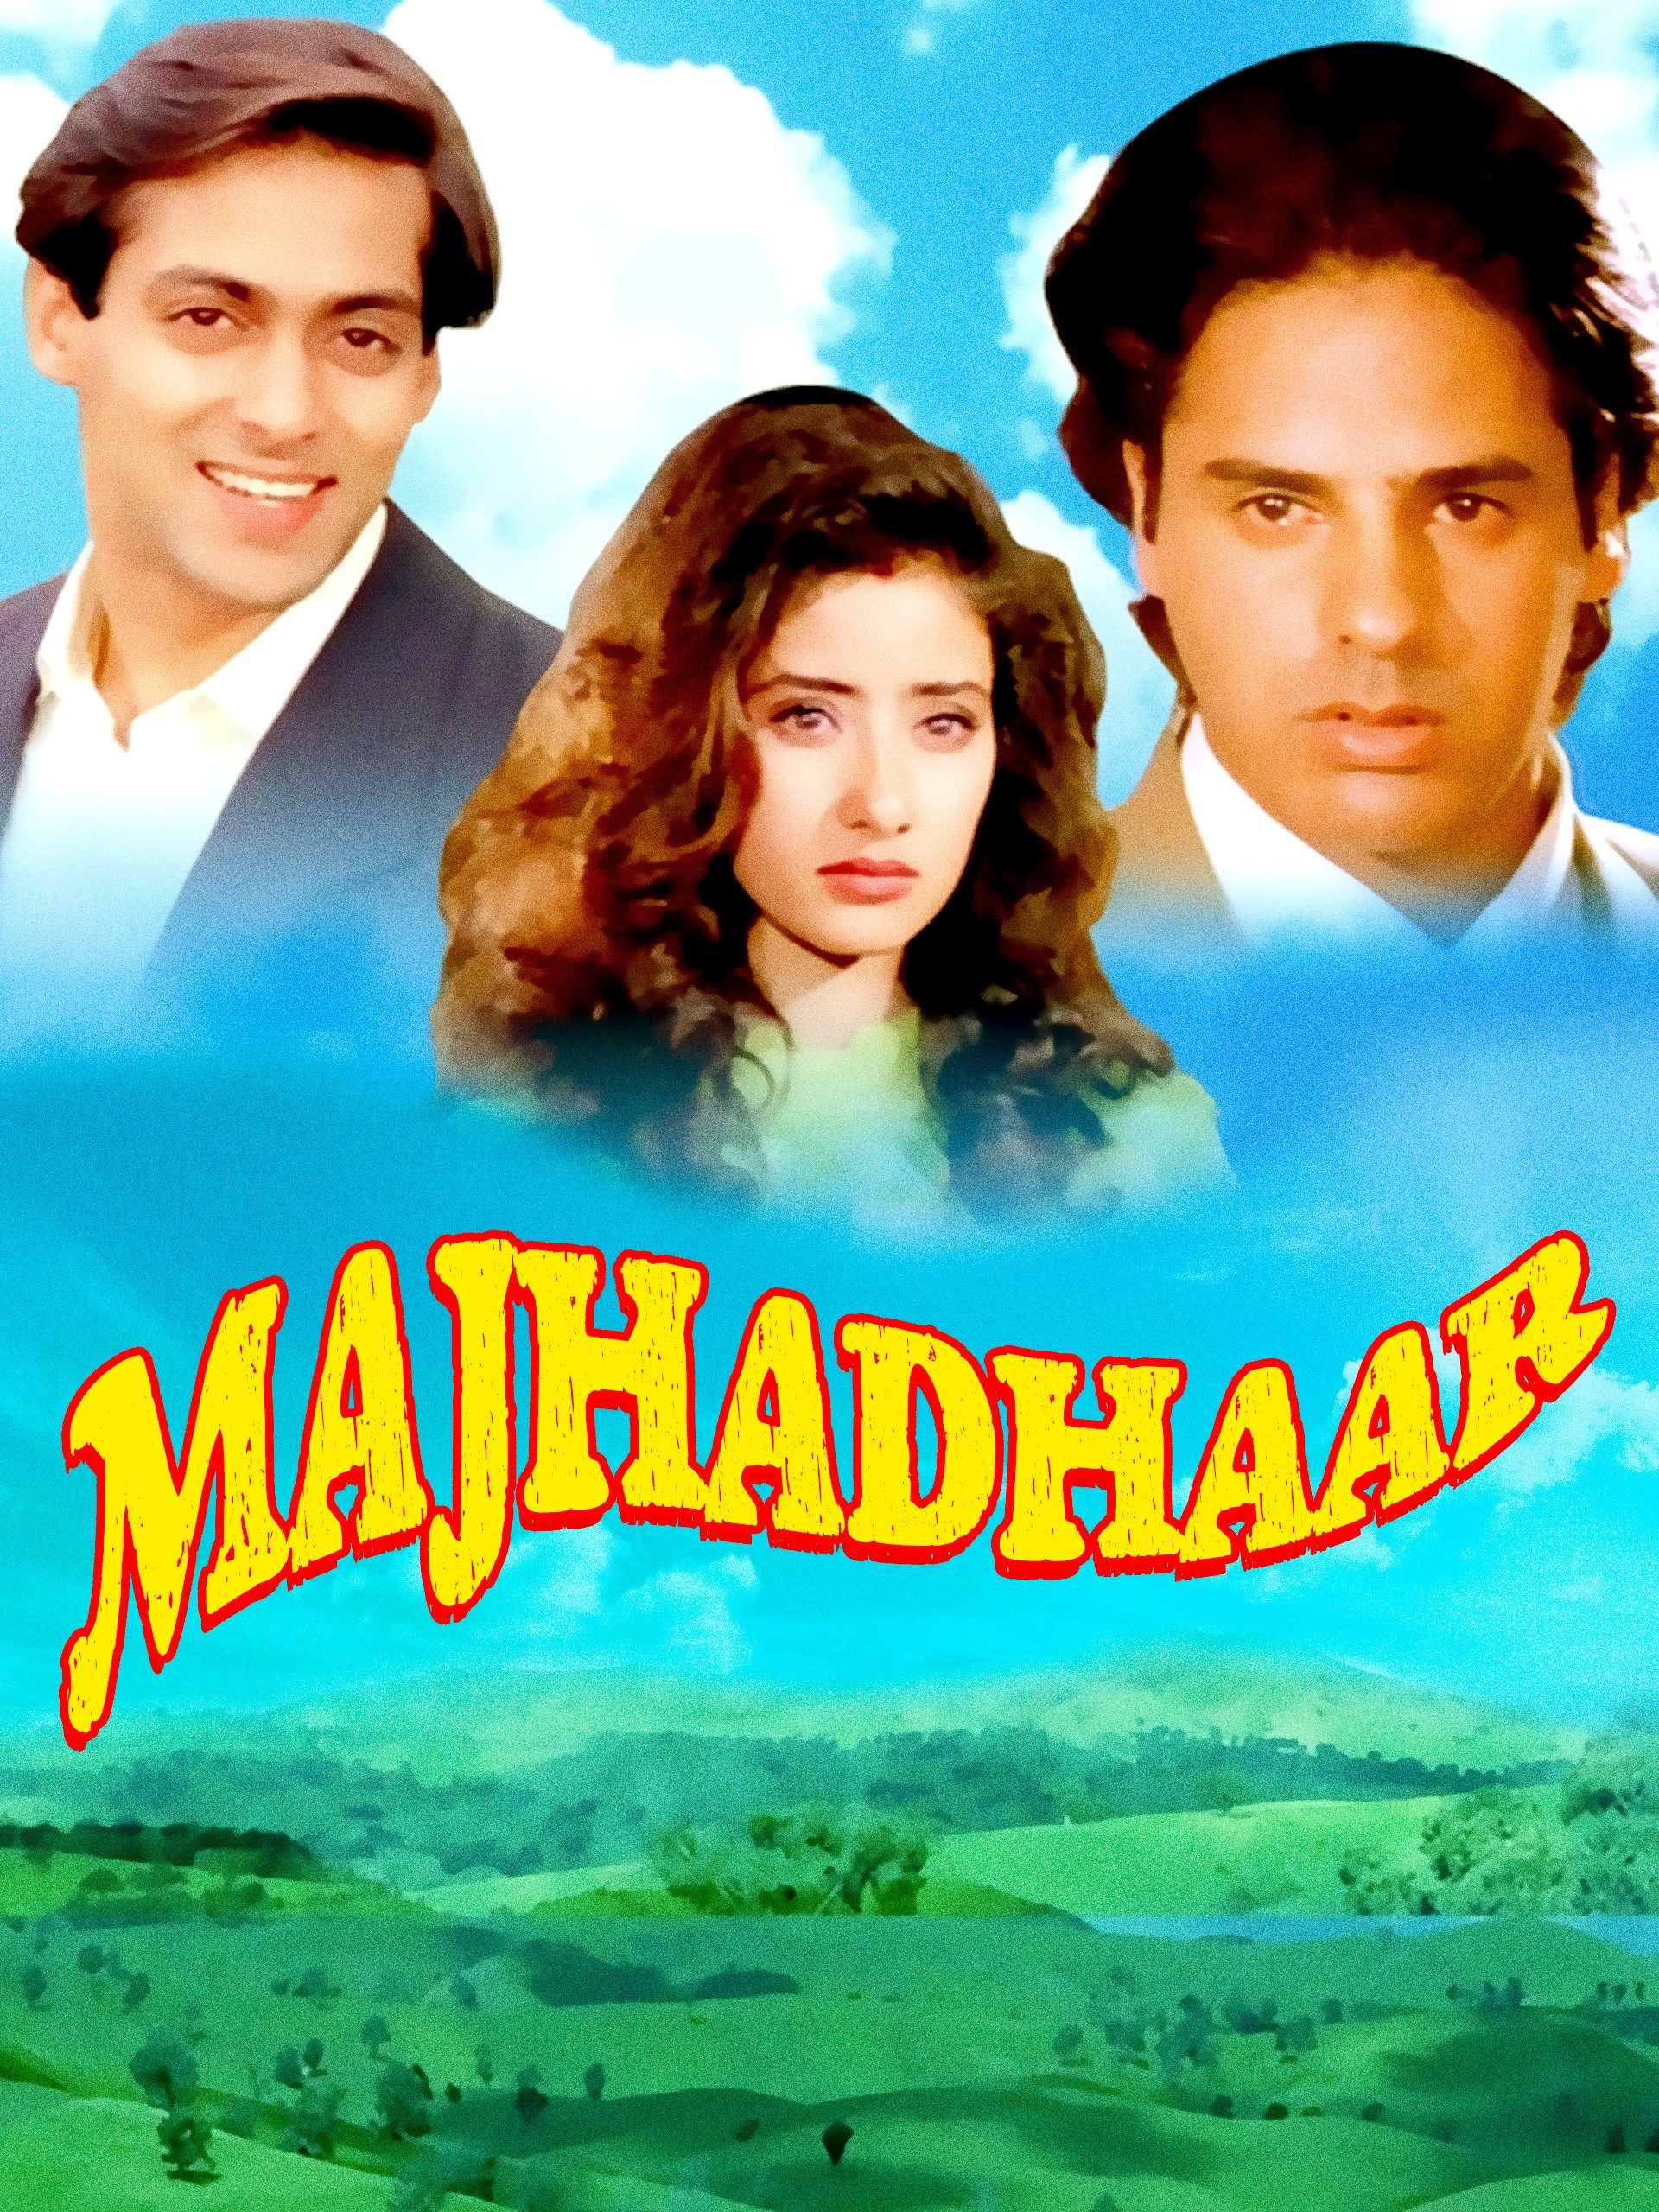 Yeh majhdhaar movie in hd download wattpad.